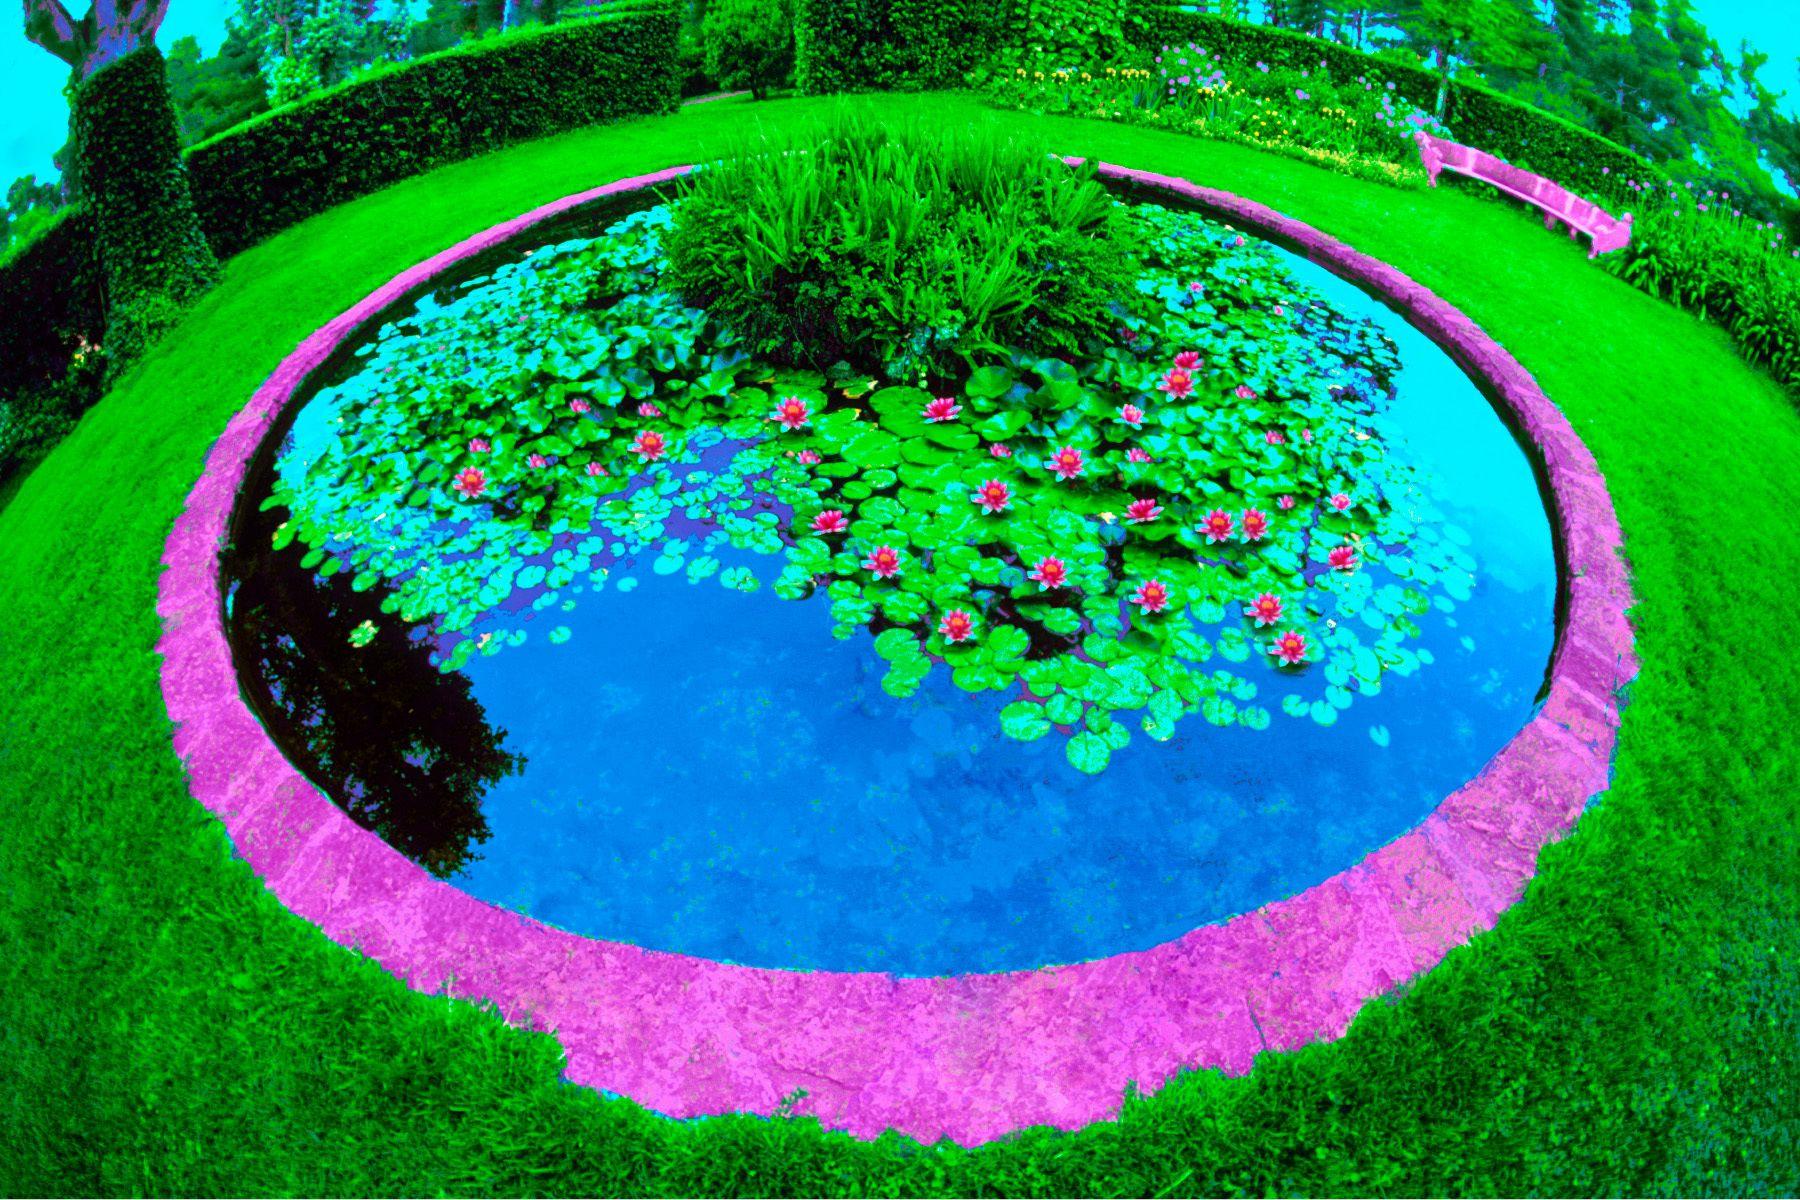 2_0_80_1f_gottlieb_lily_pond.jpg